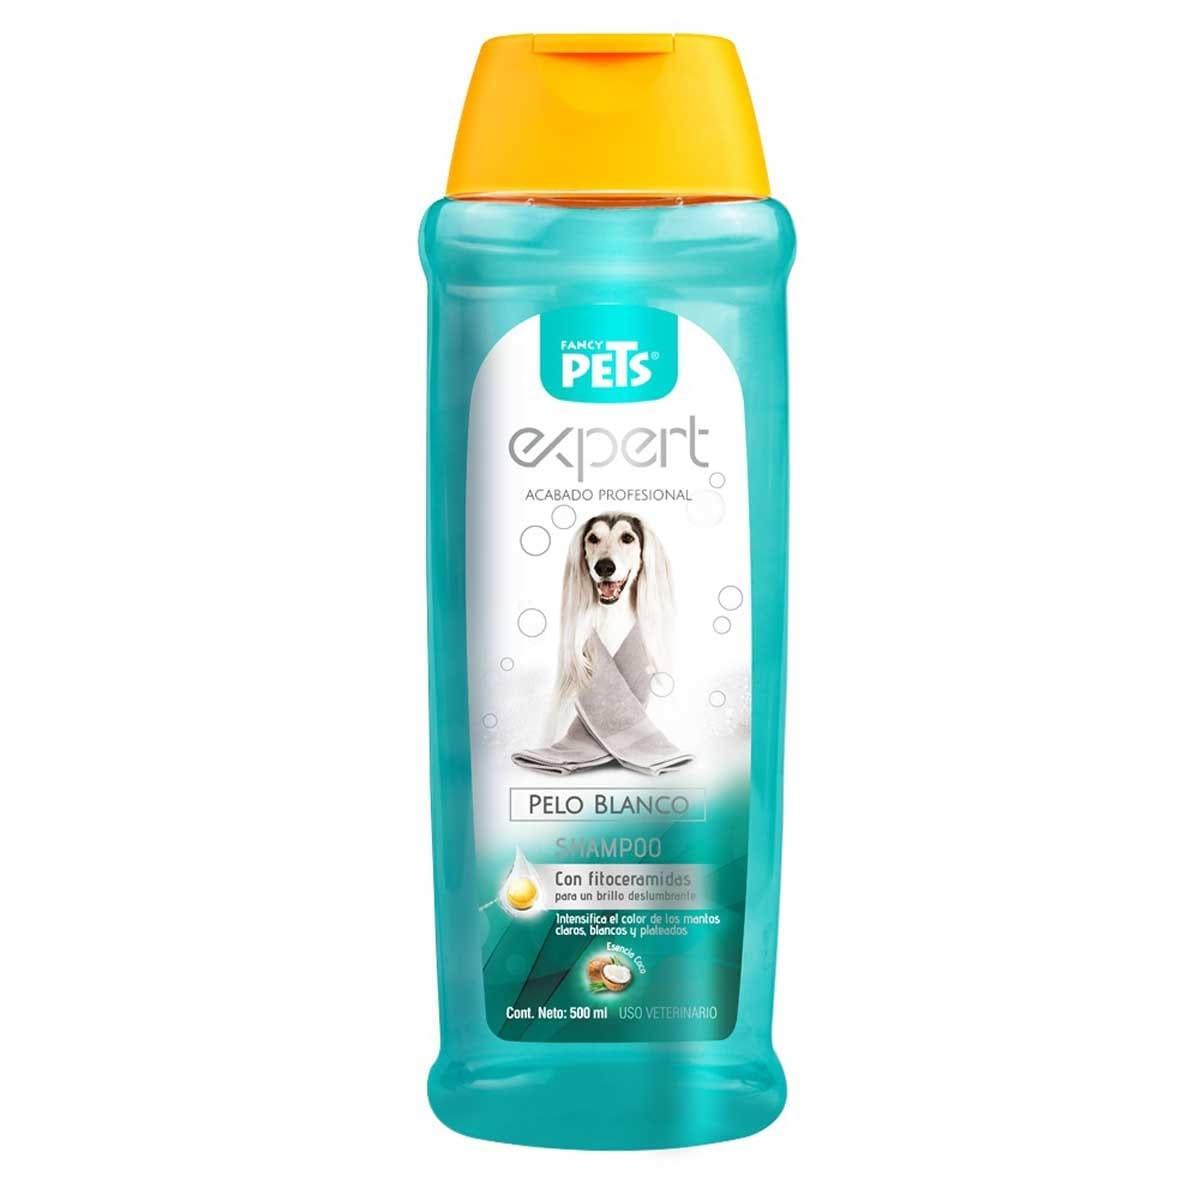 Shampoo para Pelo Blanco Expert 500Ml Acuario Lomas